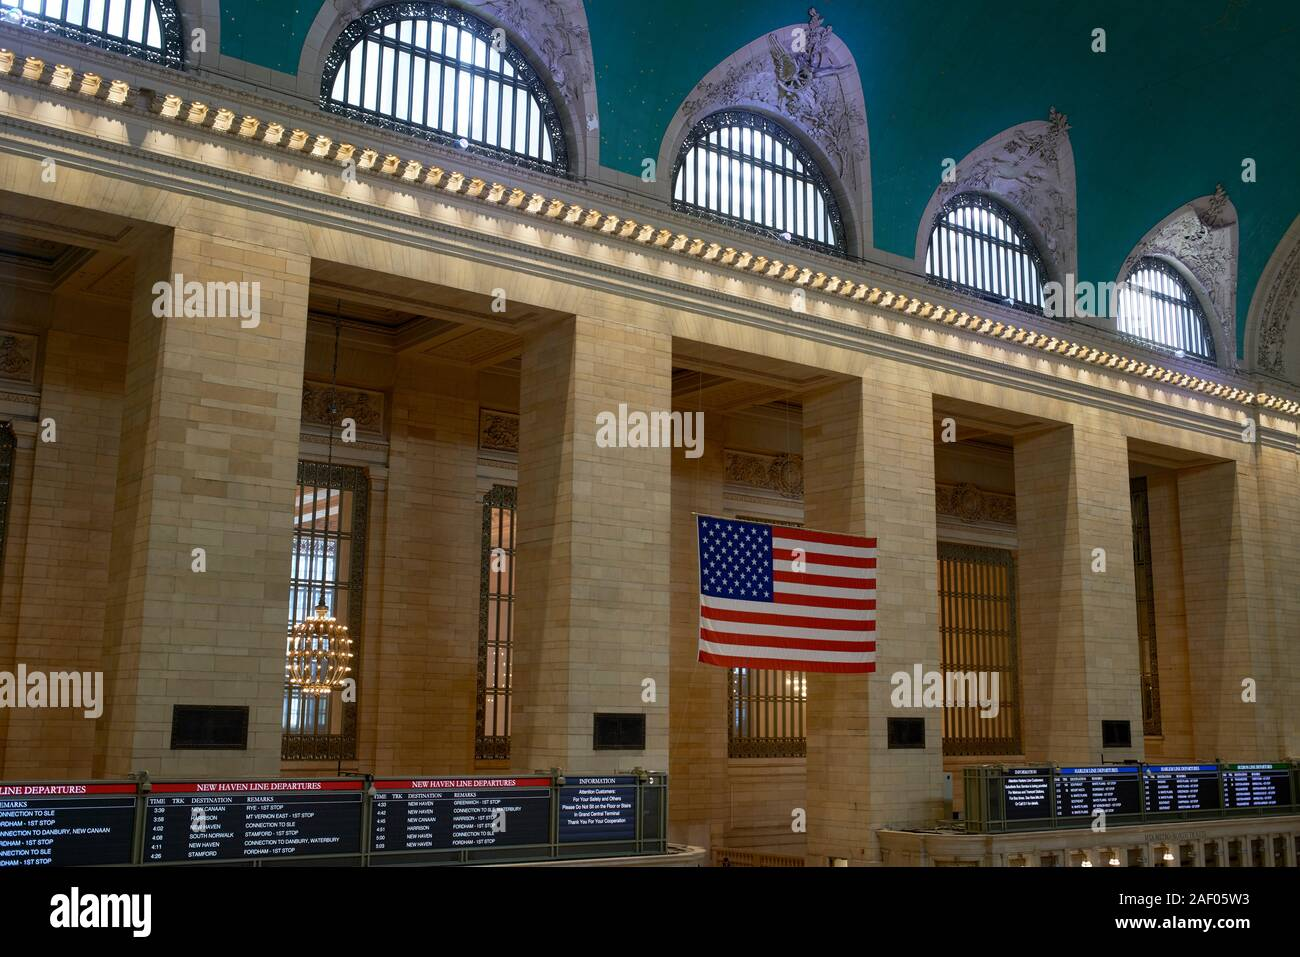 Innenraum des Grand Central Station in New York City. Stockfoto